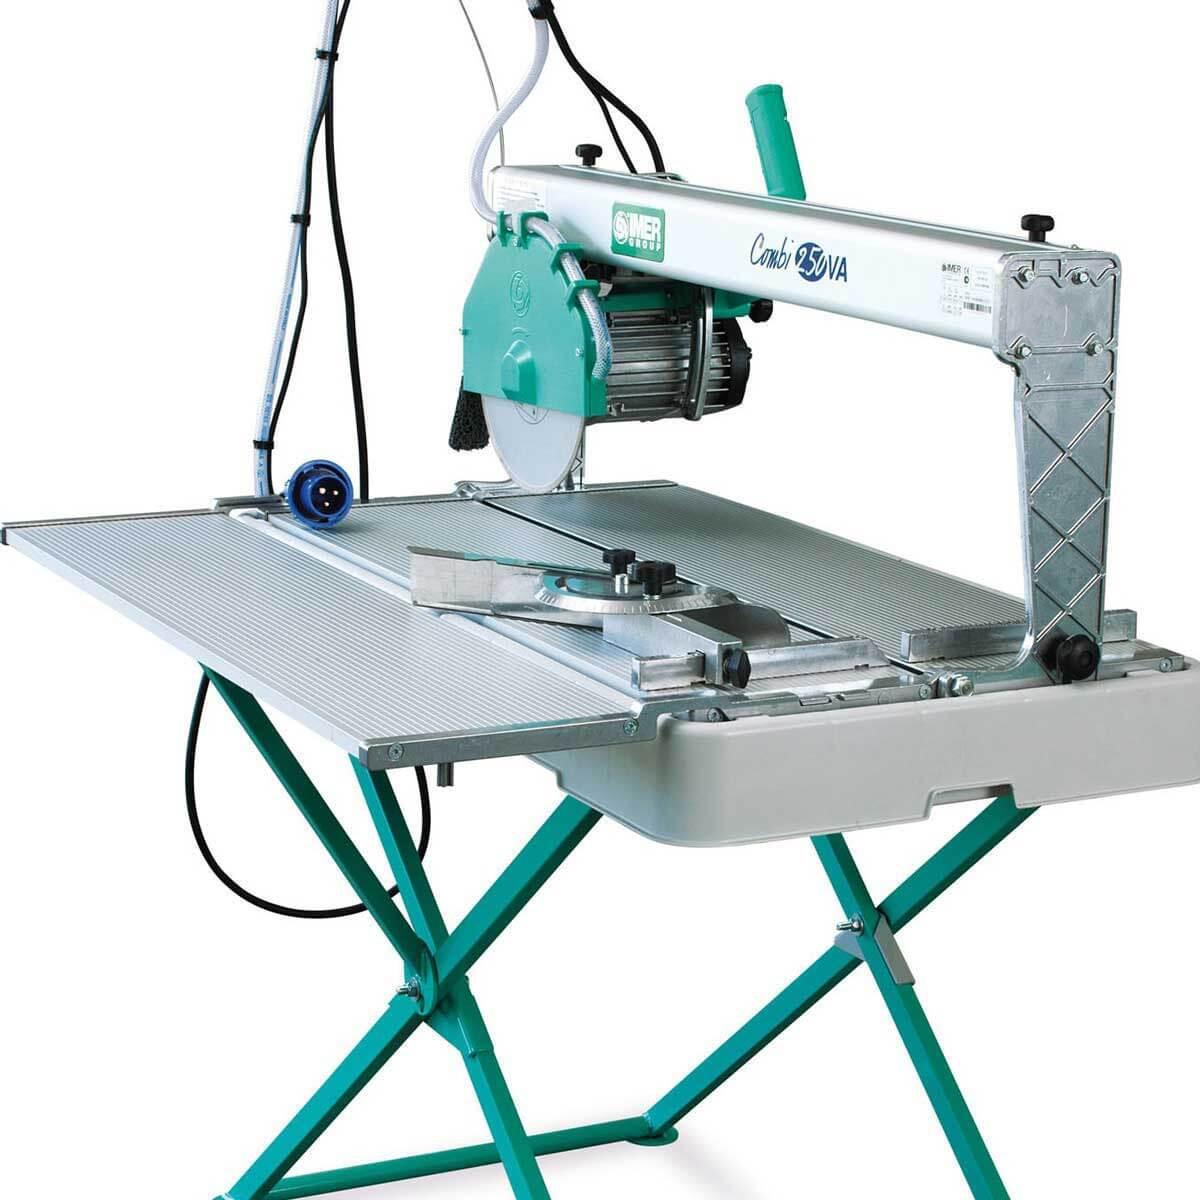 Imer Combi 250VA saw with scissor stand